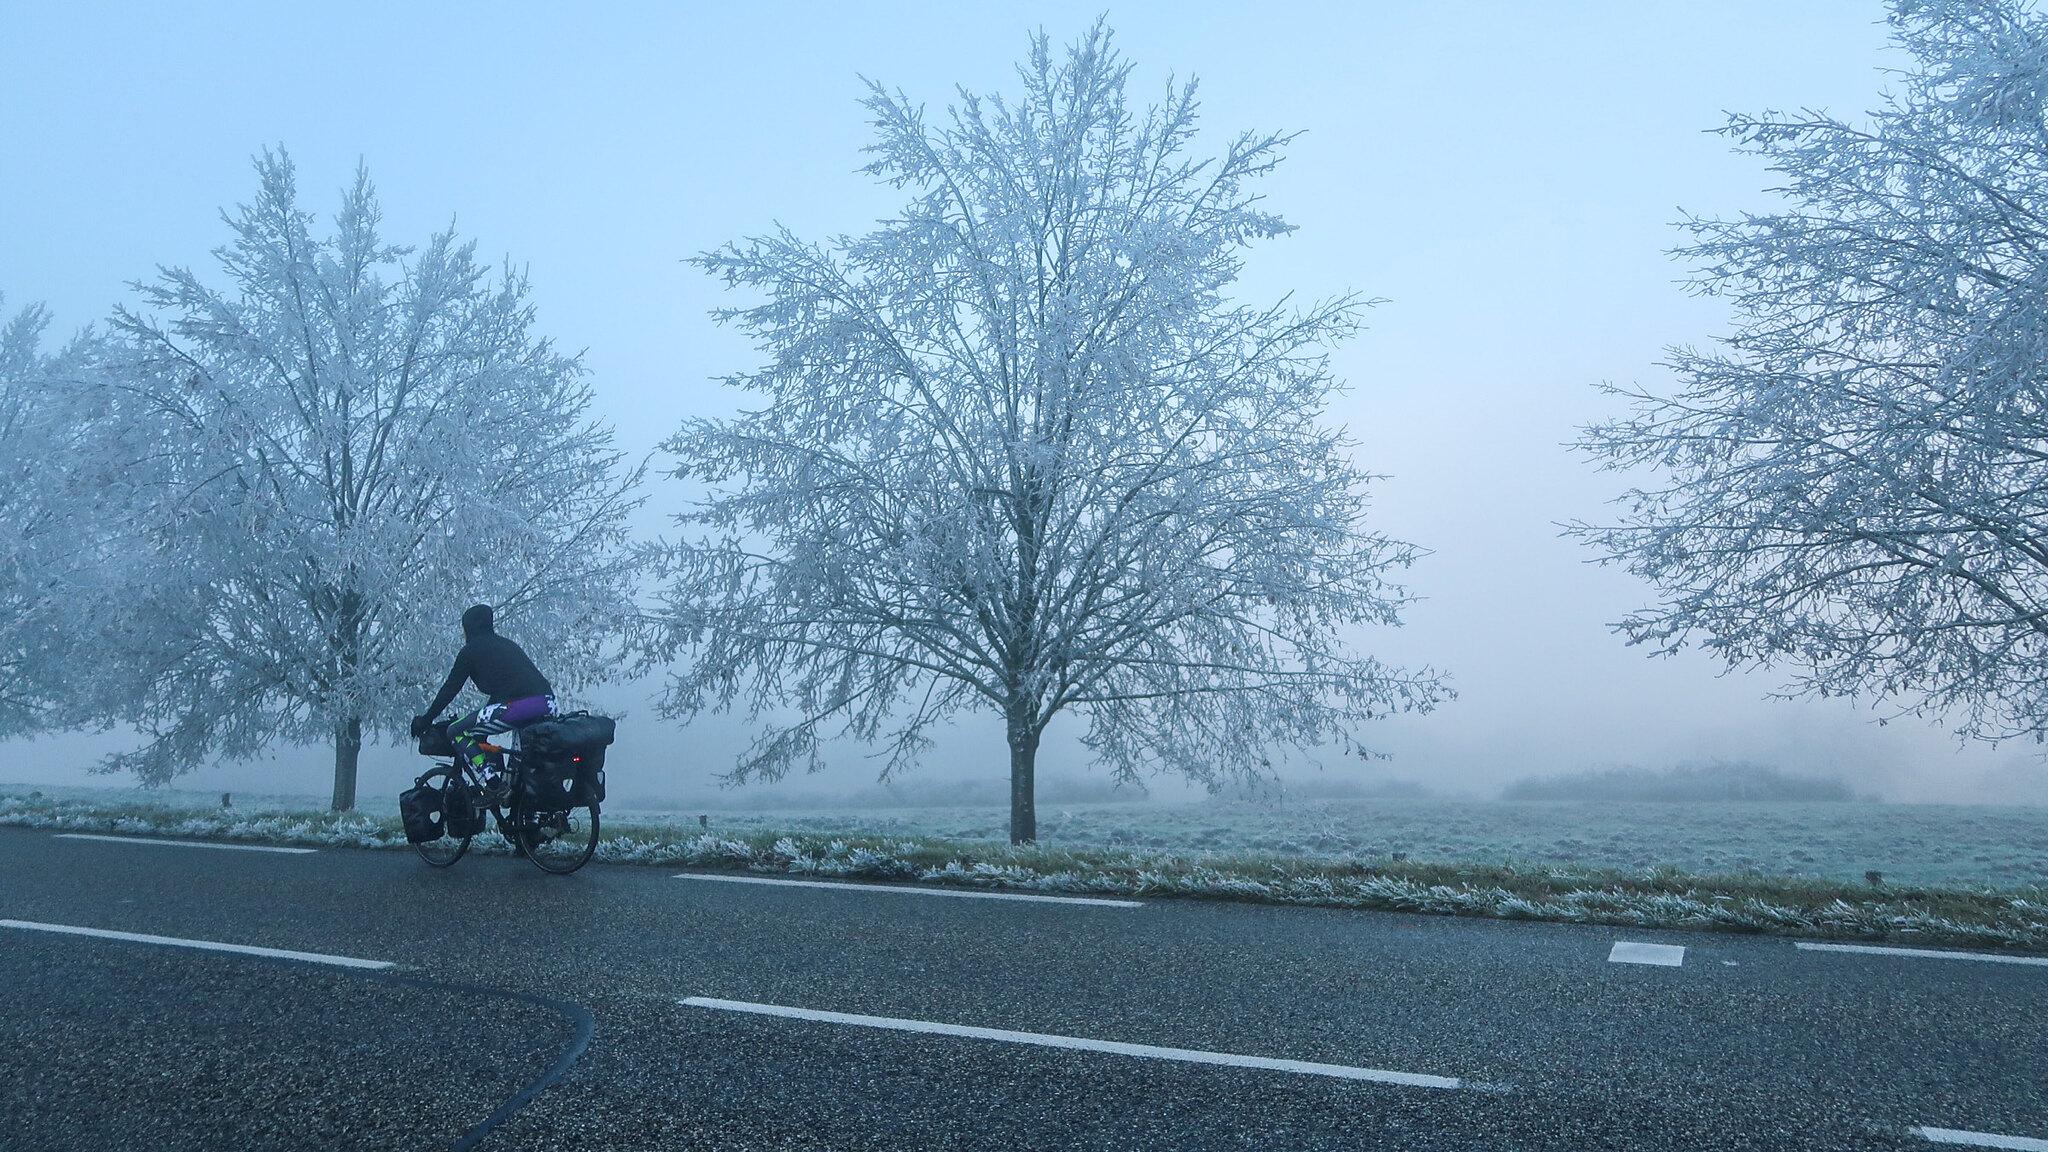 On the misty roads